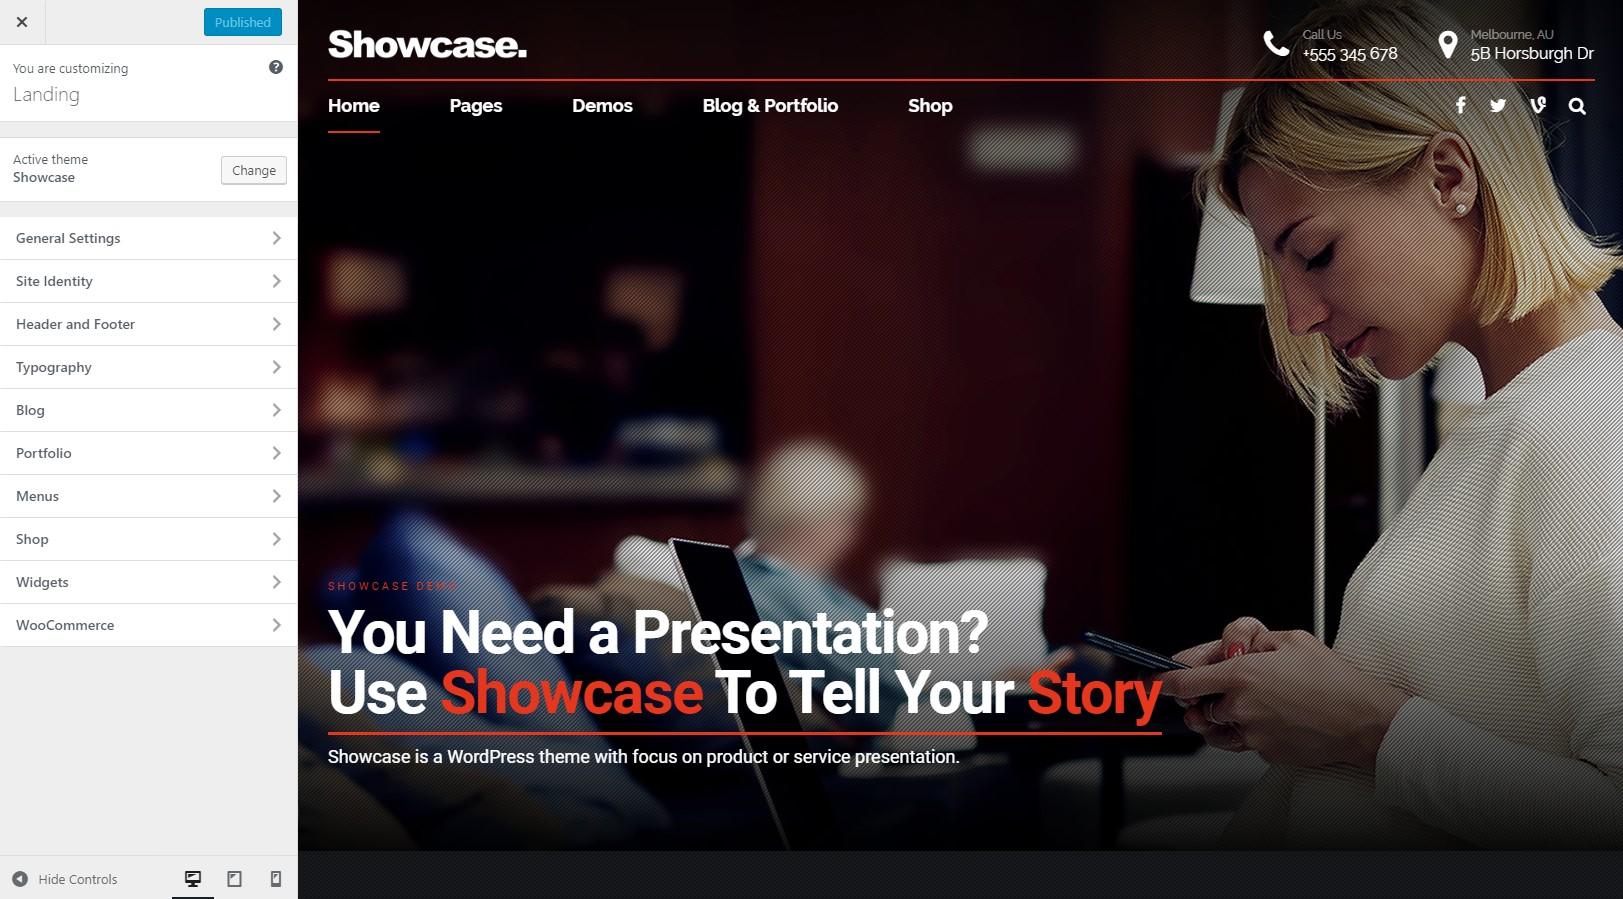 https://documentation.bold-themes.com/showcase/wp-content/uploads/sites/46/2019/09/customize.jpg